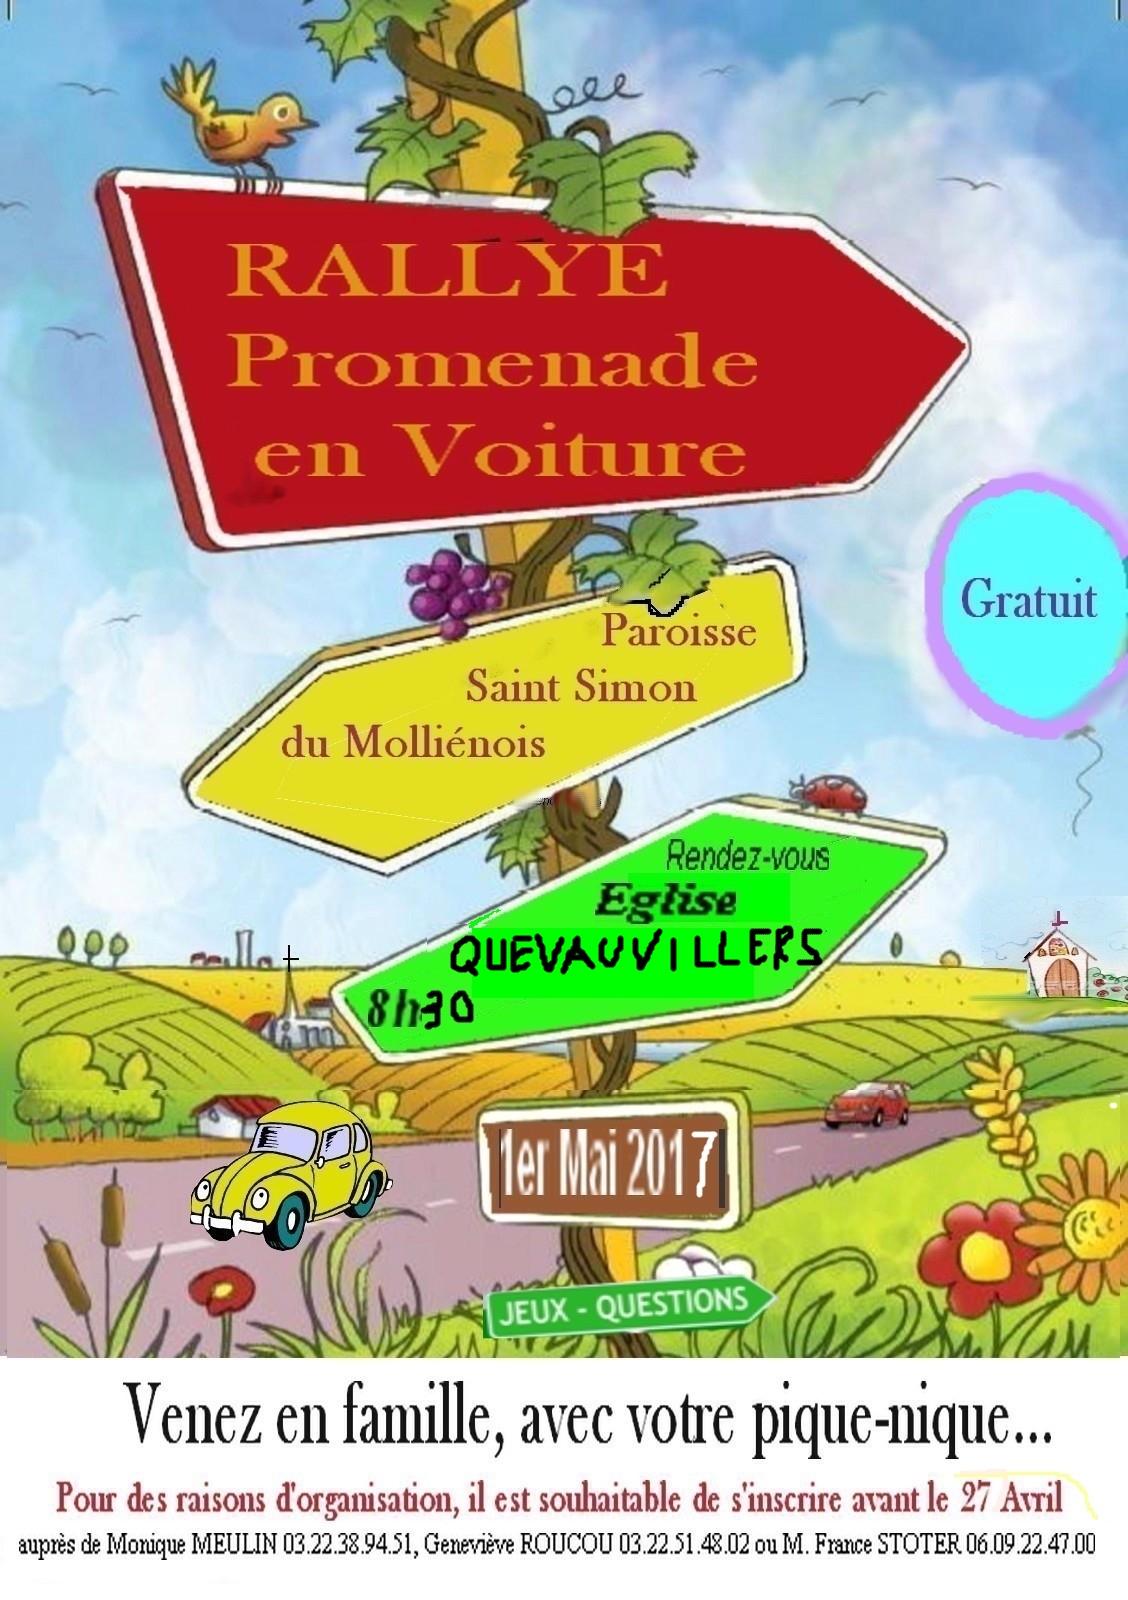 Rallye a pied